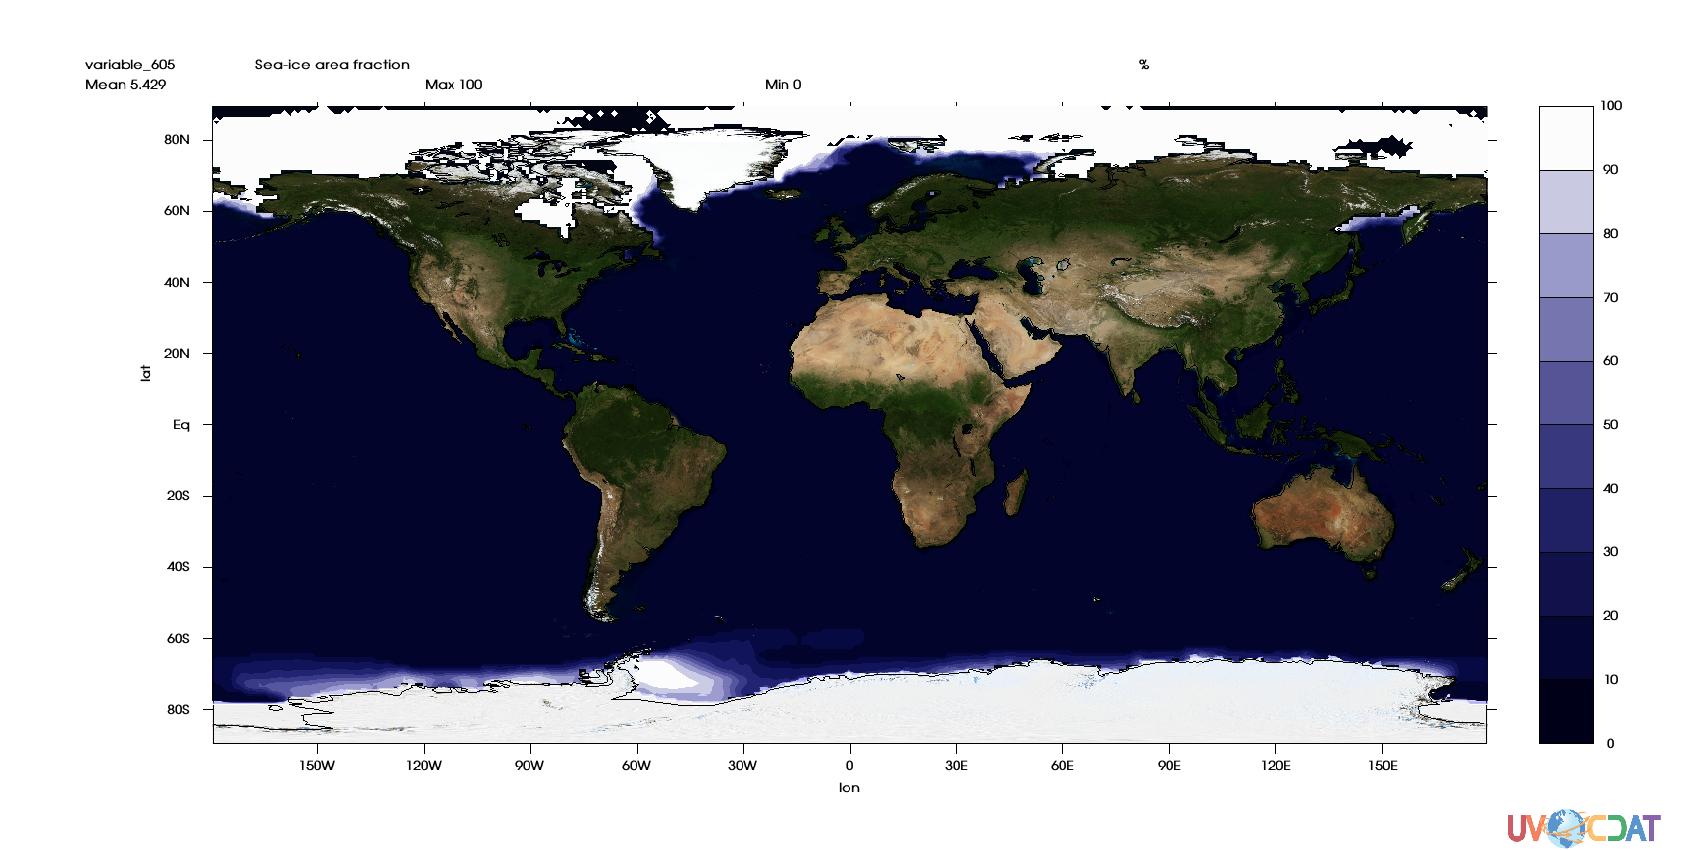 bluemarble_siconc_satellite_view_daytimeview